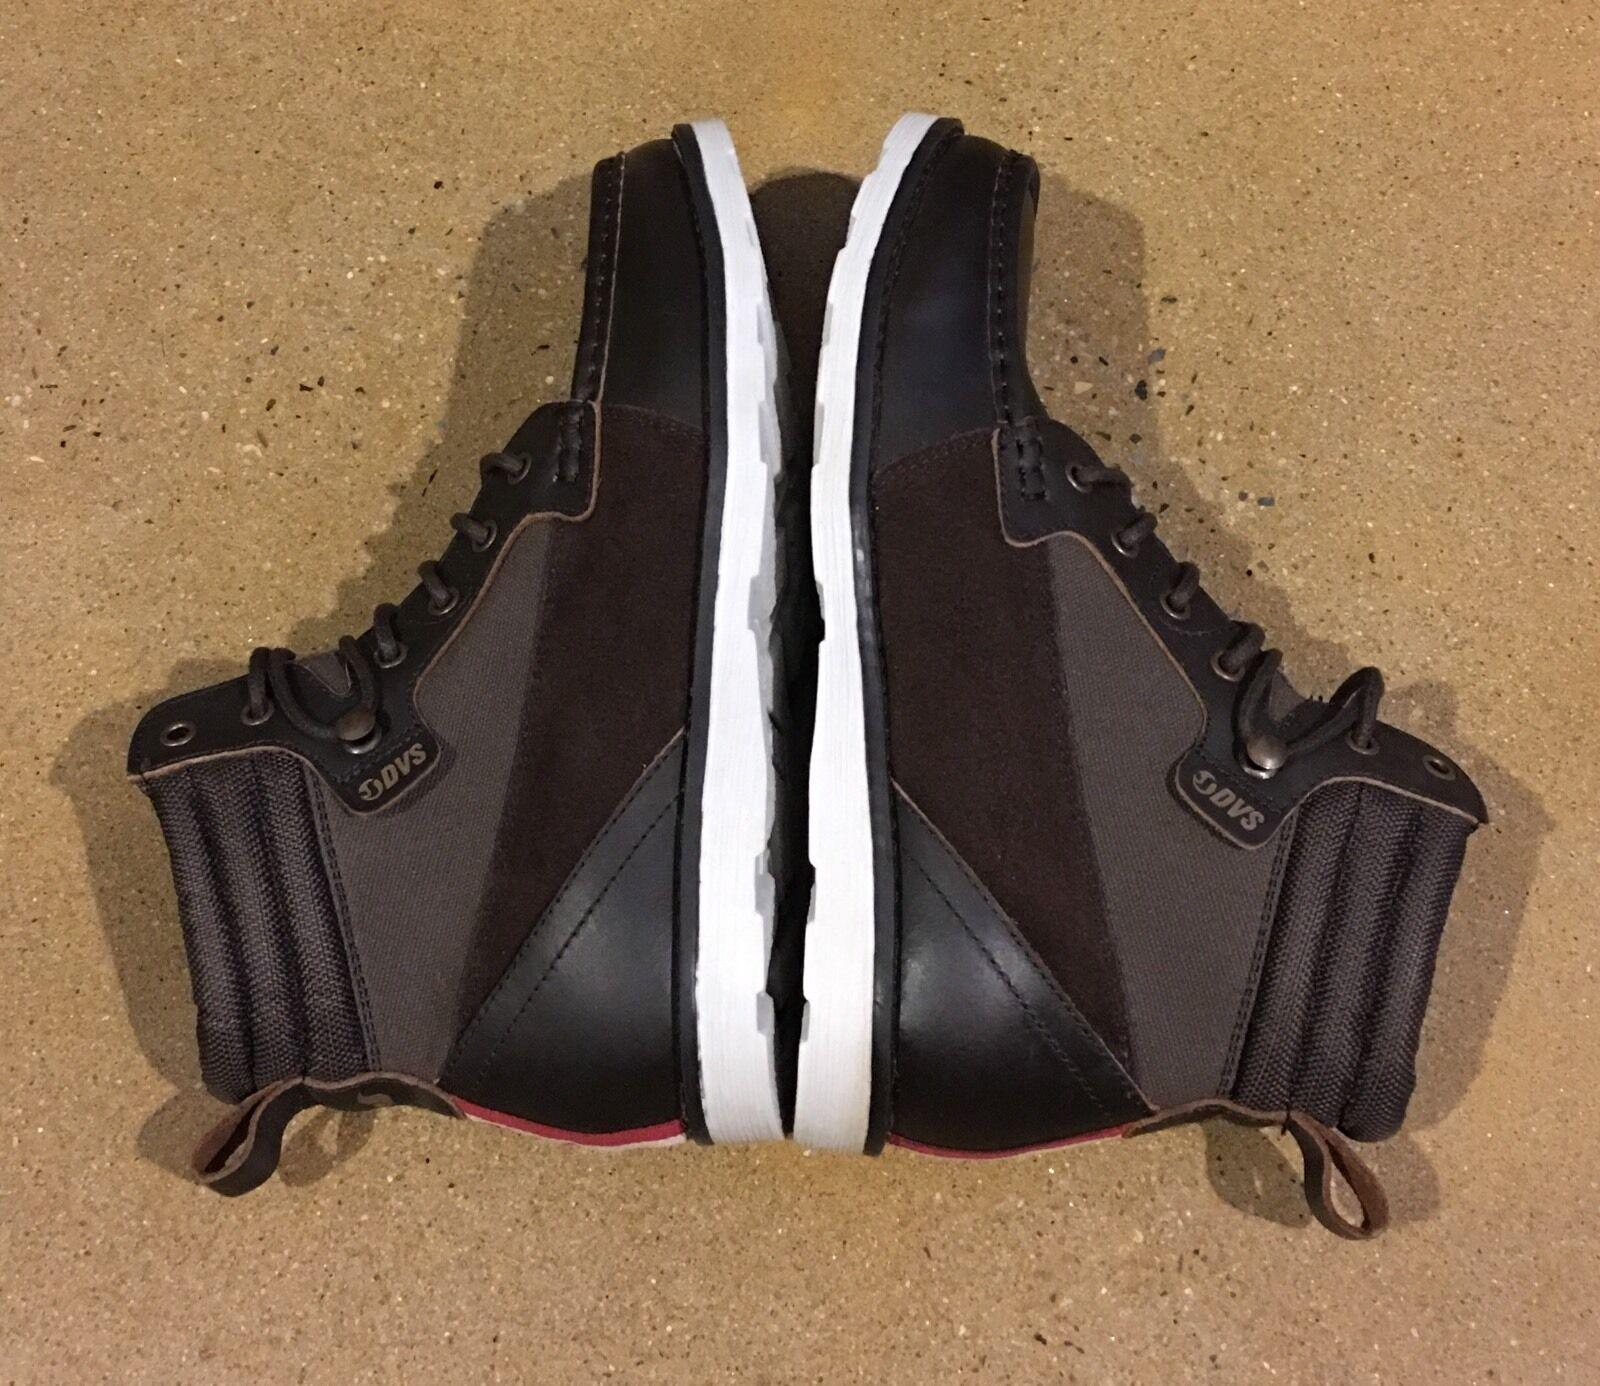 DVS Bishop Boots Men's Size 7.5 US Brown Leather Cordura BMX DC Skate Chukkas